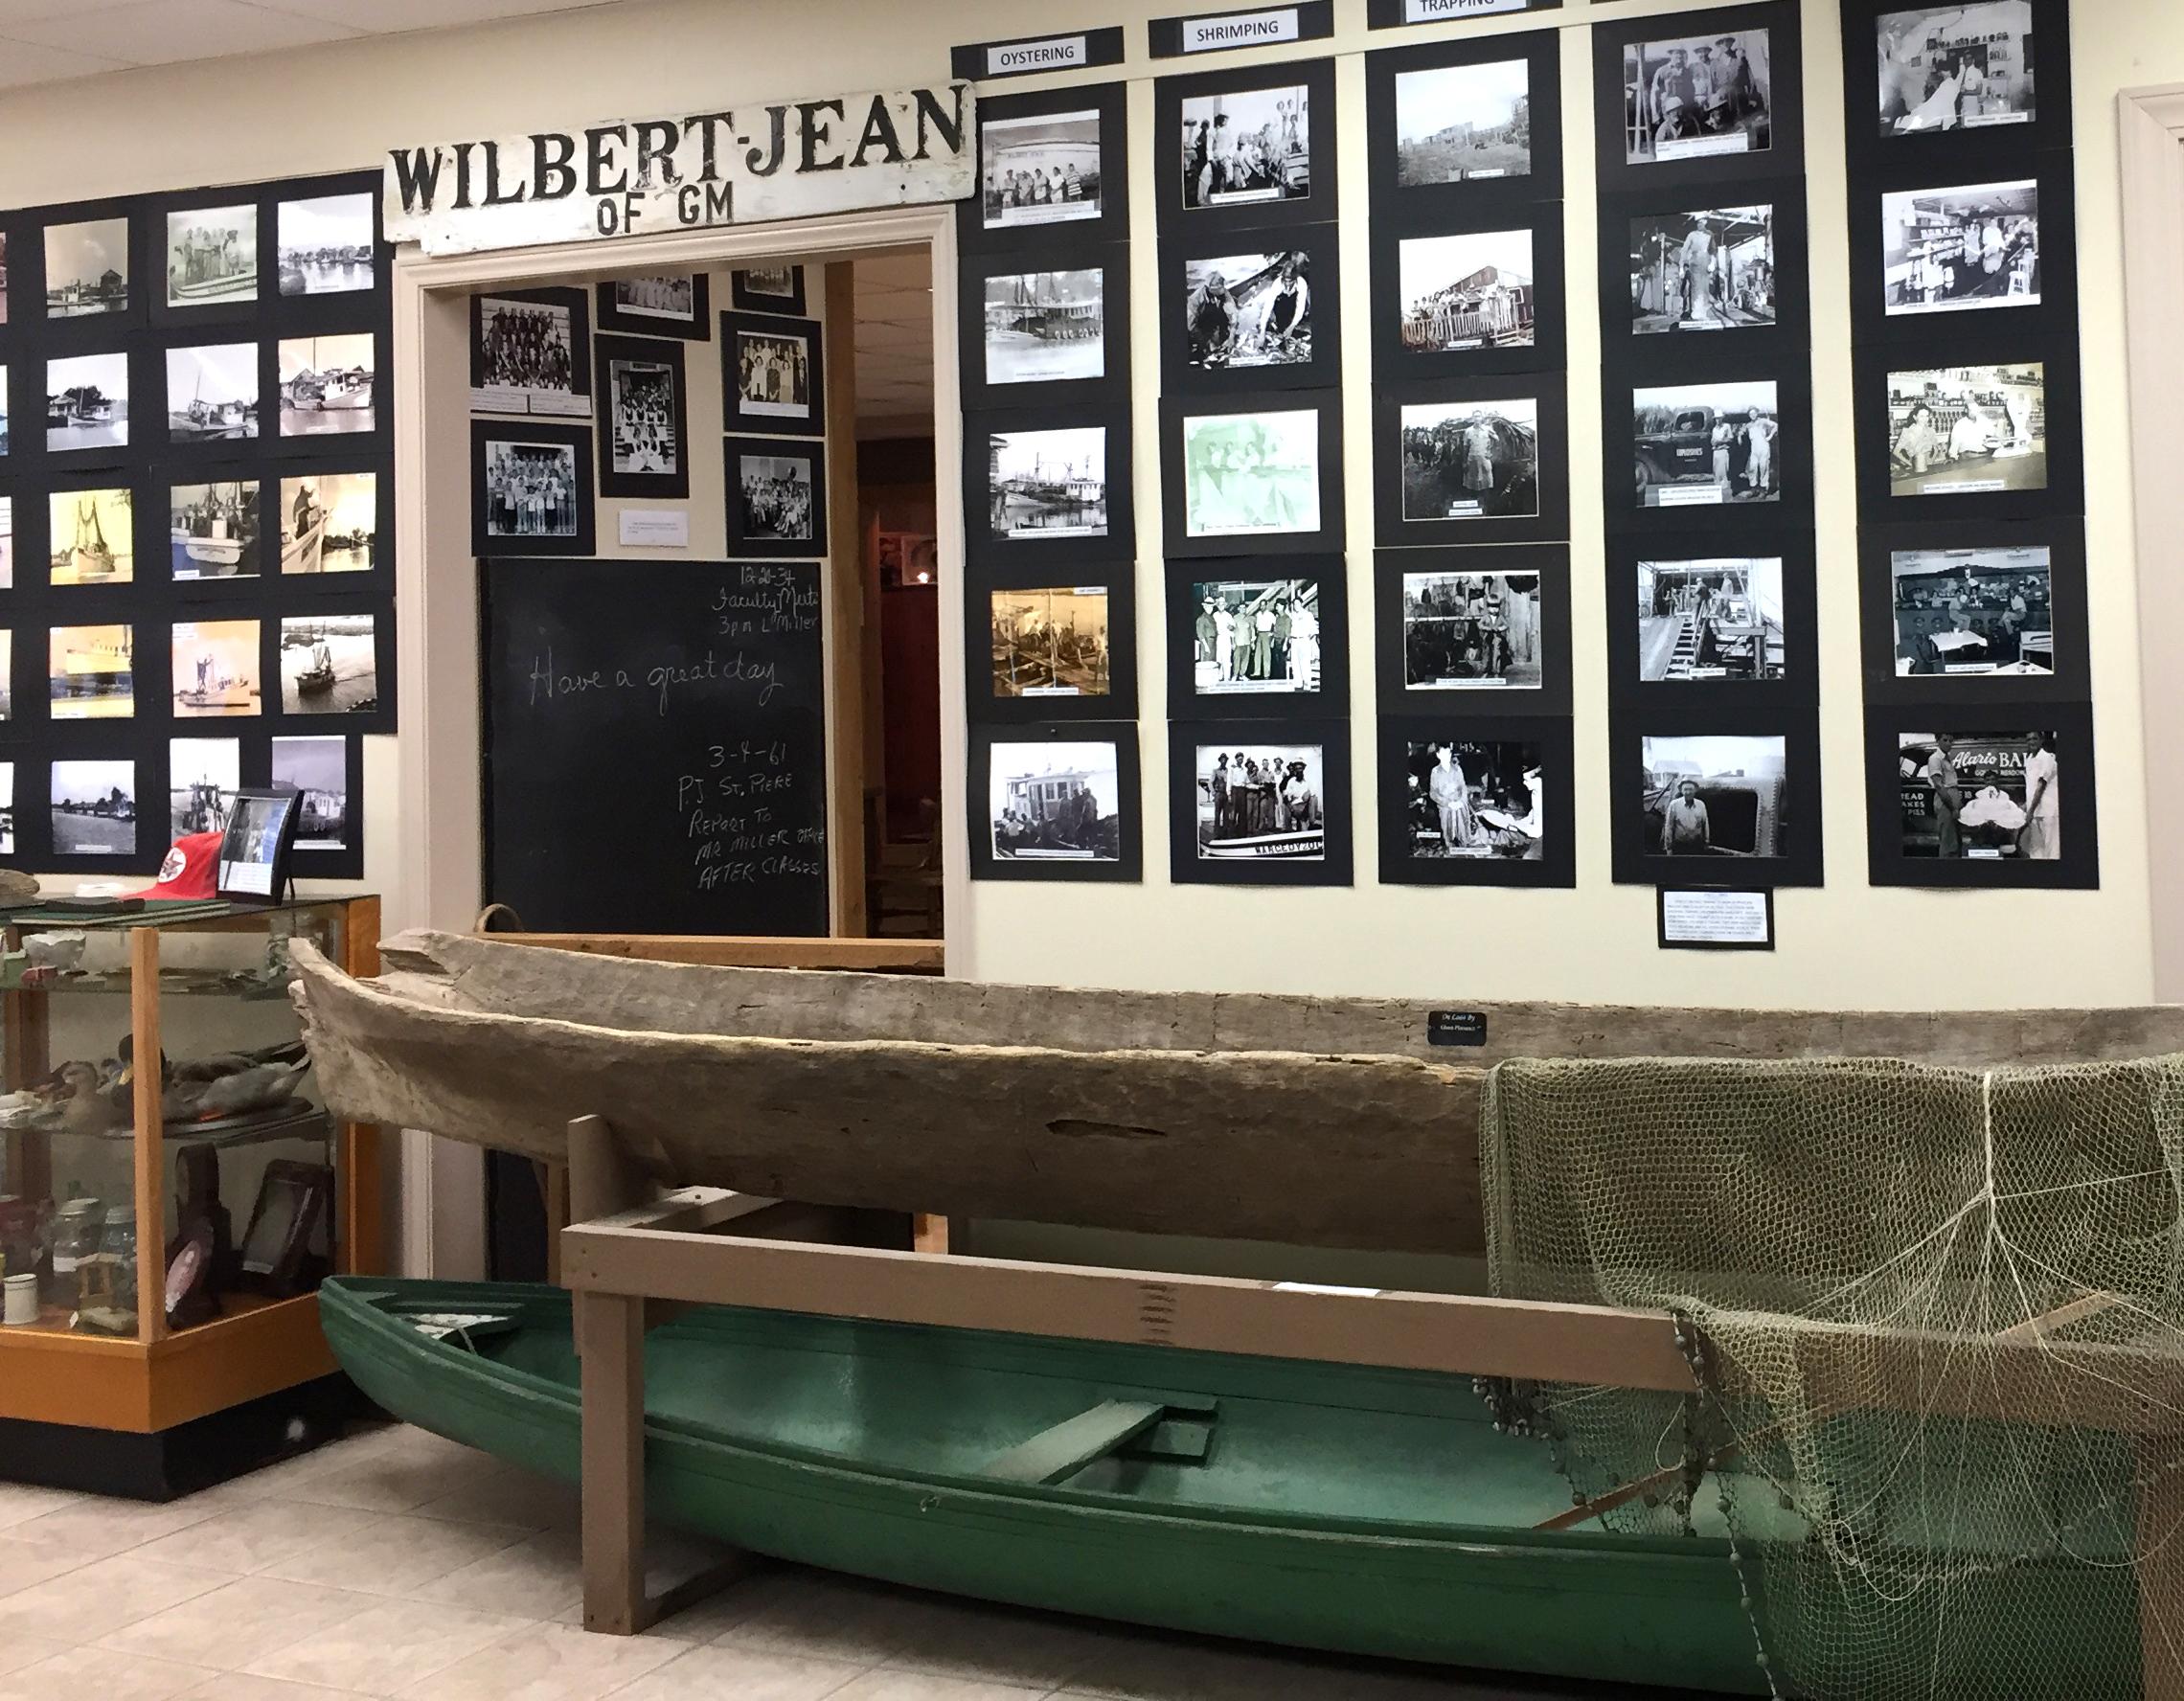 Photo memory wall at Golden Meadow Library, Louisiana